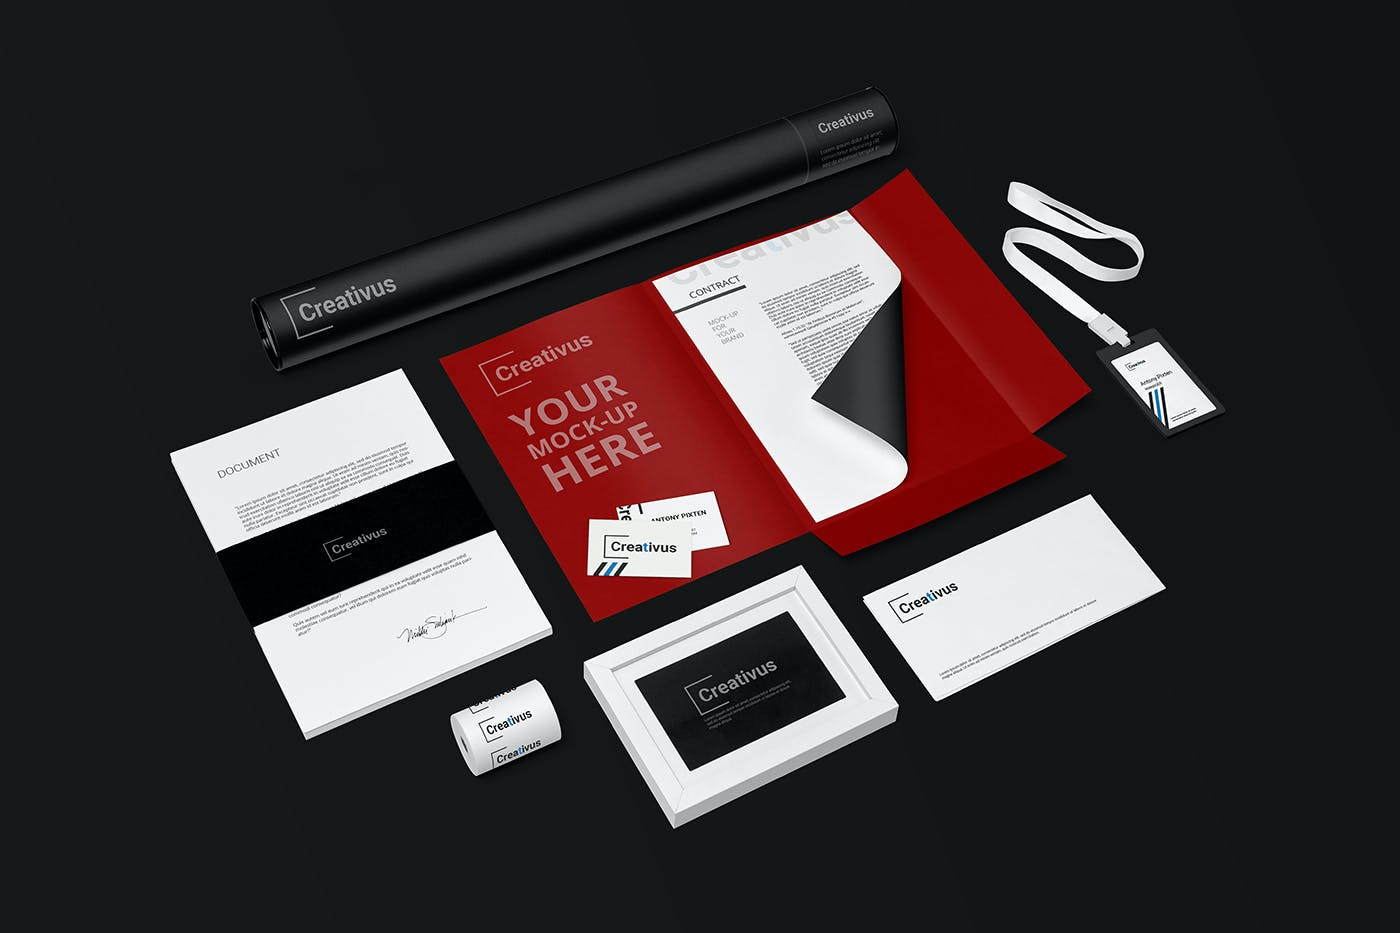 7款品牌LOGO设计办公用品展示贴图样机 Branding Stationery Mockup插图(2)